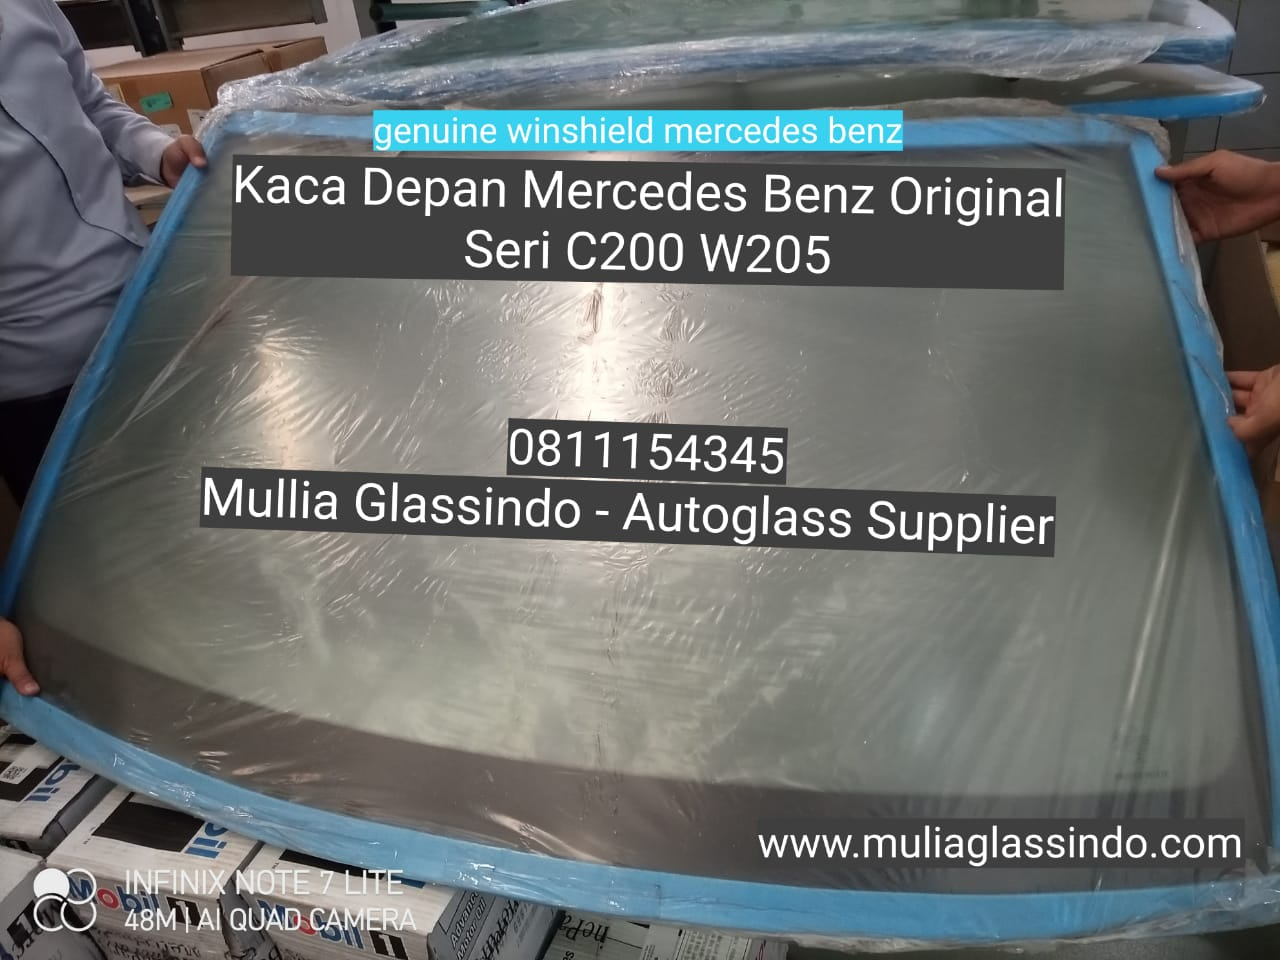 Ready Stok Kaca Depan Mercedes Benz W205 Original Berlogo Mercy